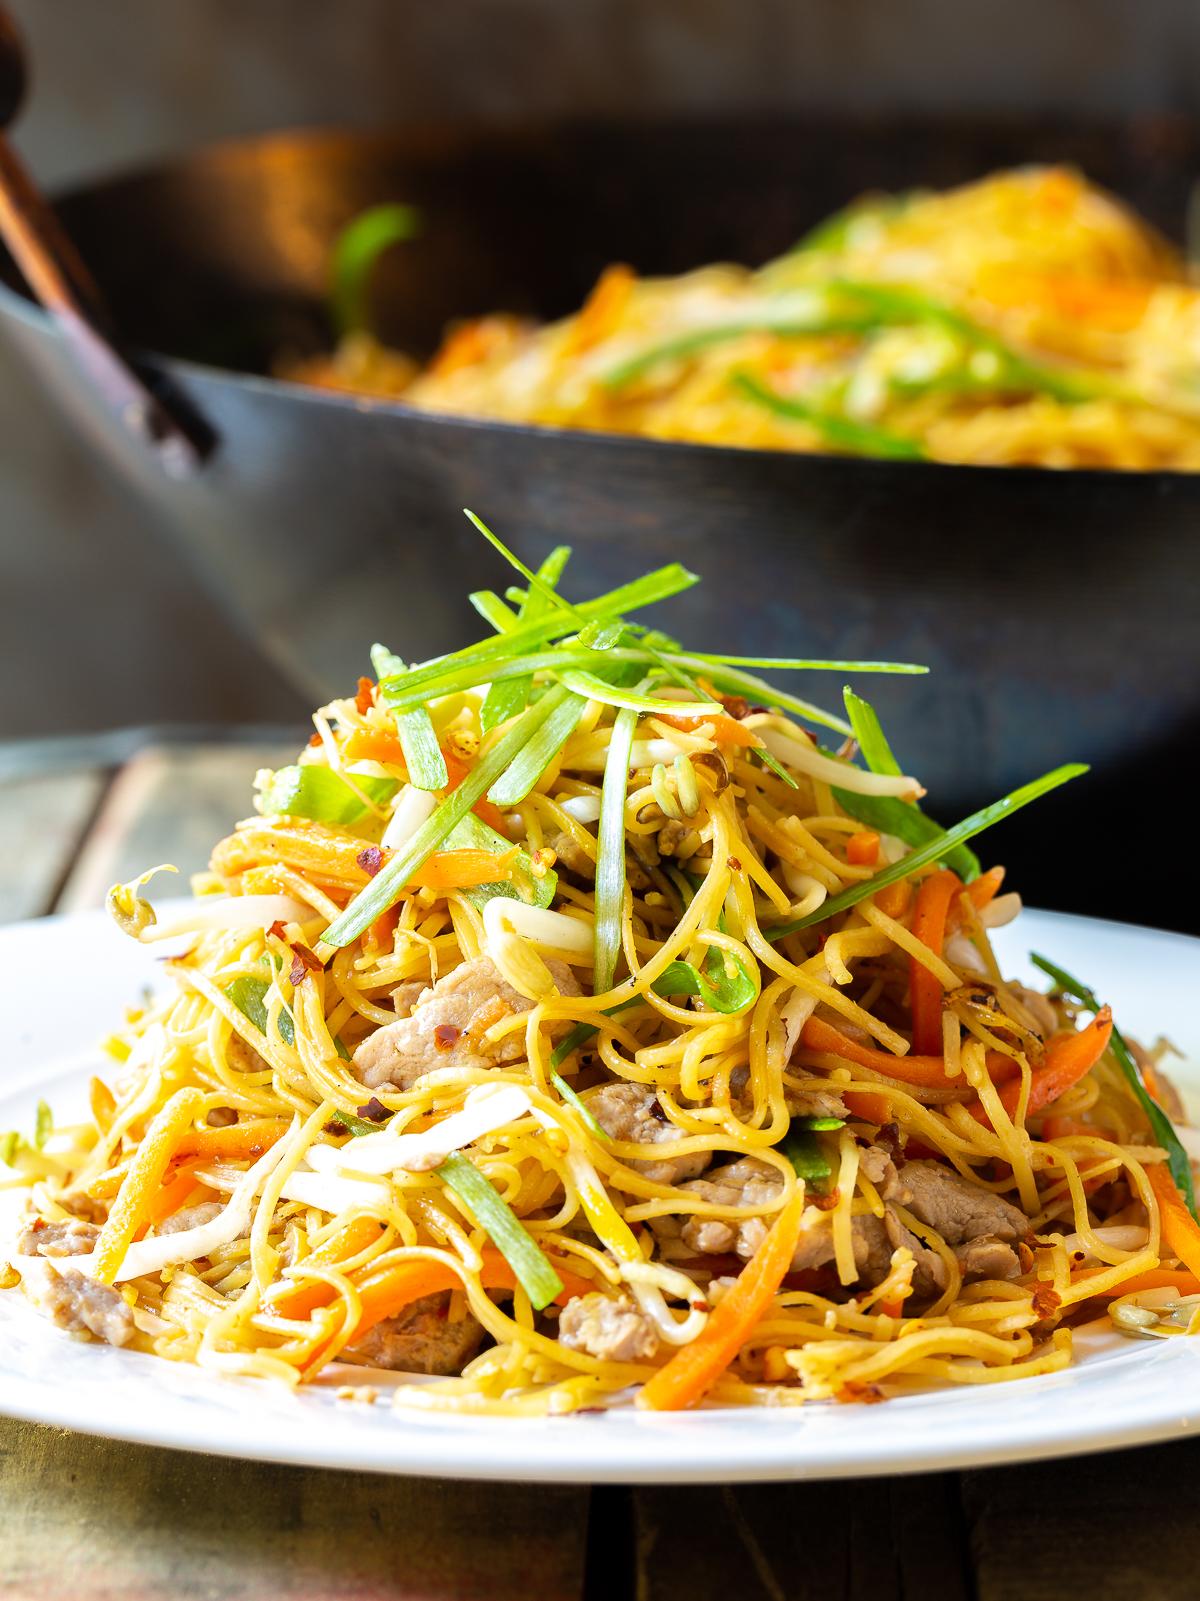 Cantonese Pan Fried Noodles (Pork Lo Mein)